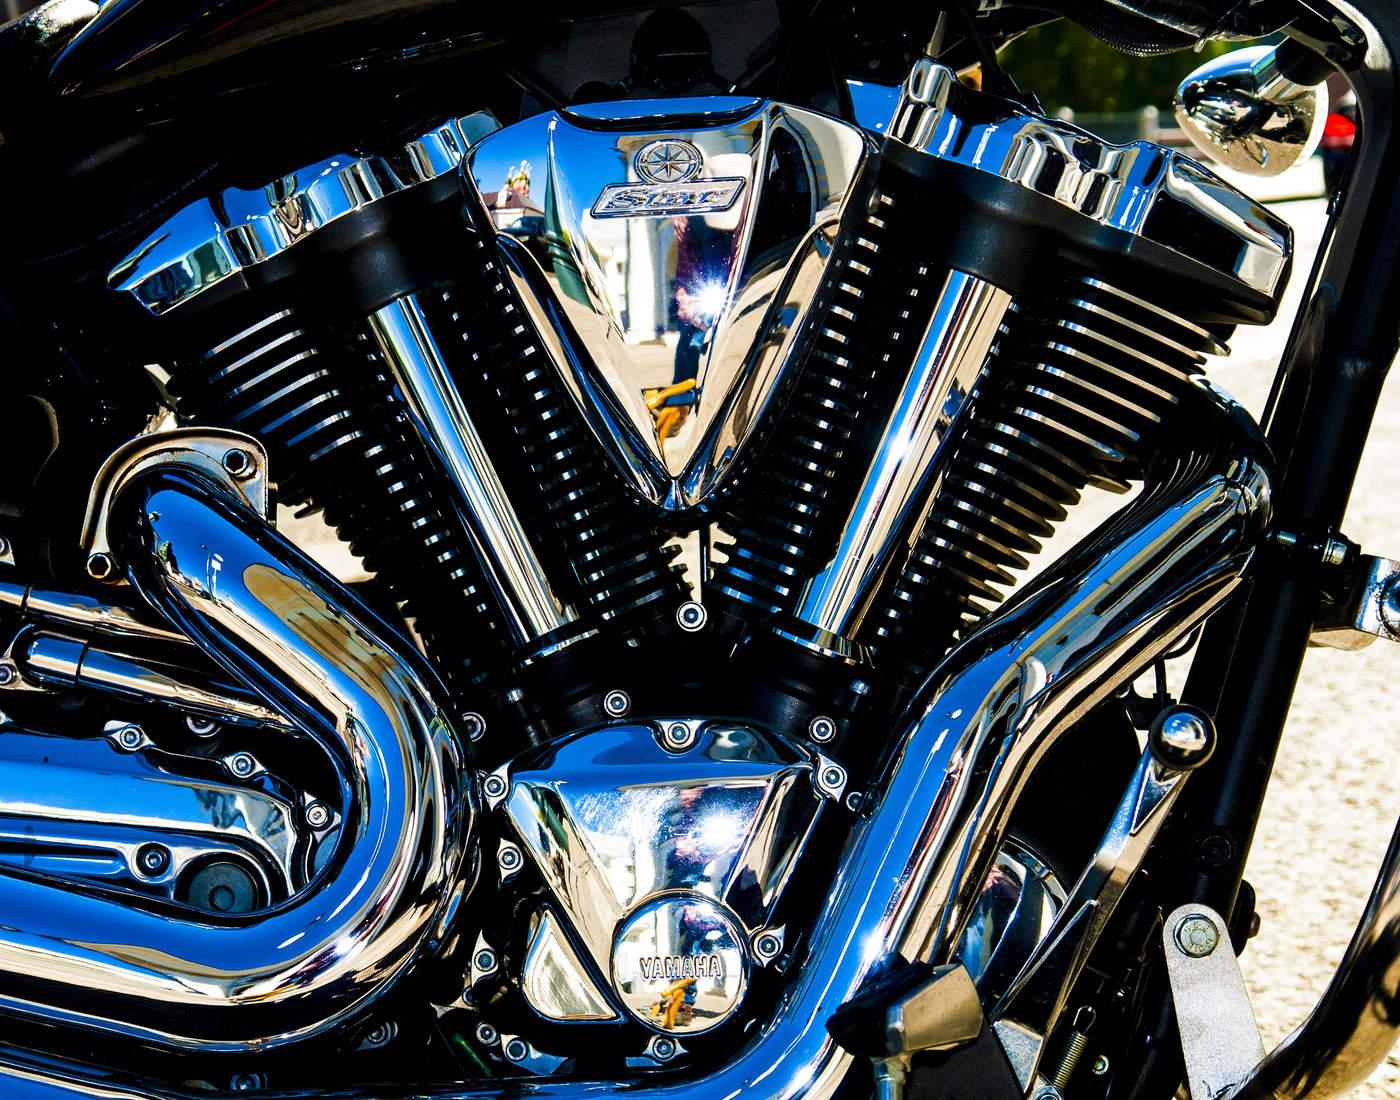 картинки мото моторов она производит